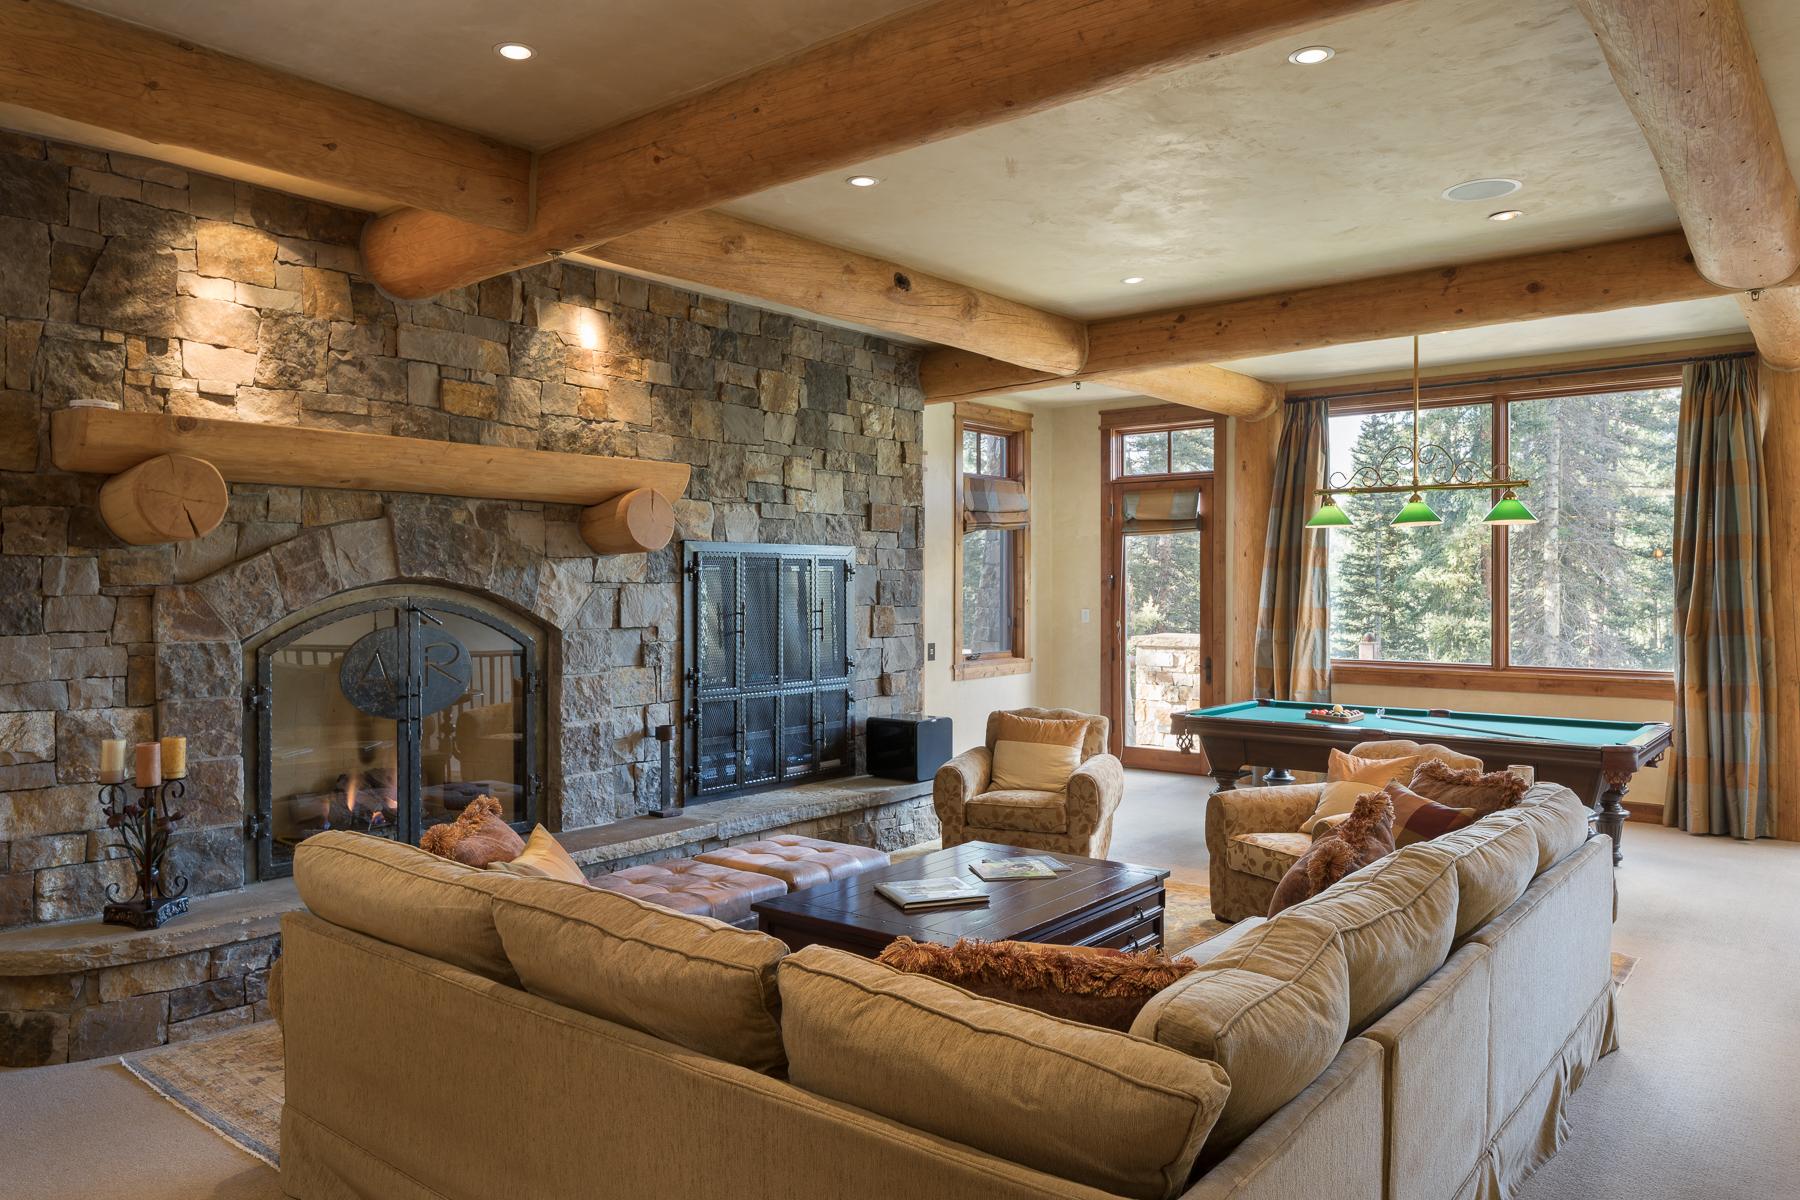 Additional photo for property listing at Autumn Ridge 112 Autumn Lane Lot 382R & 383R Mountain Village, Colorado 81435 United States